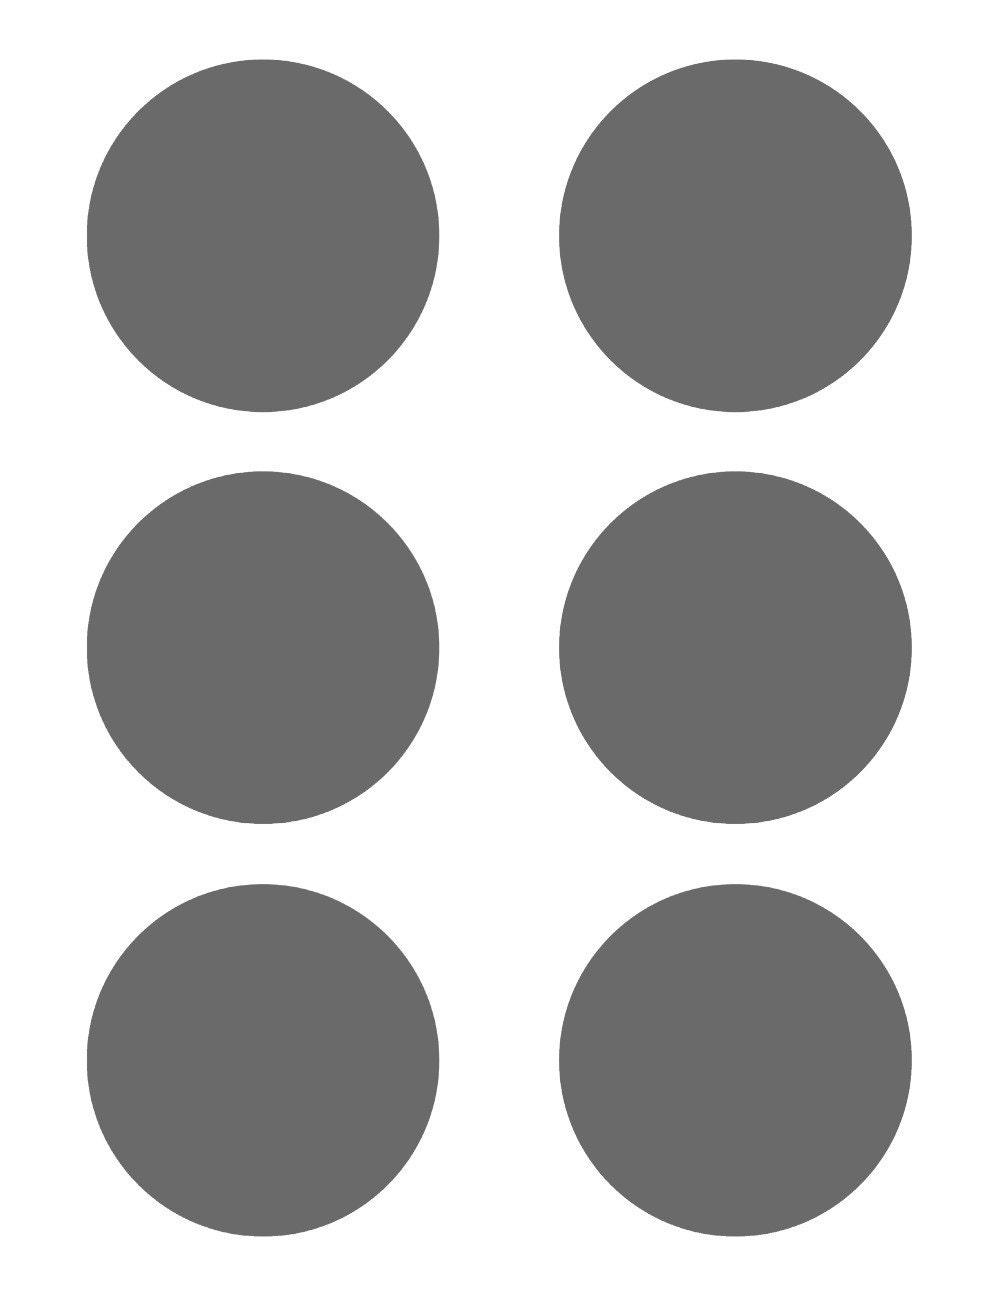 7 inch diameter circle template - psd template 6 circles 3 inch diameter